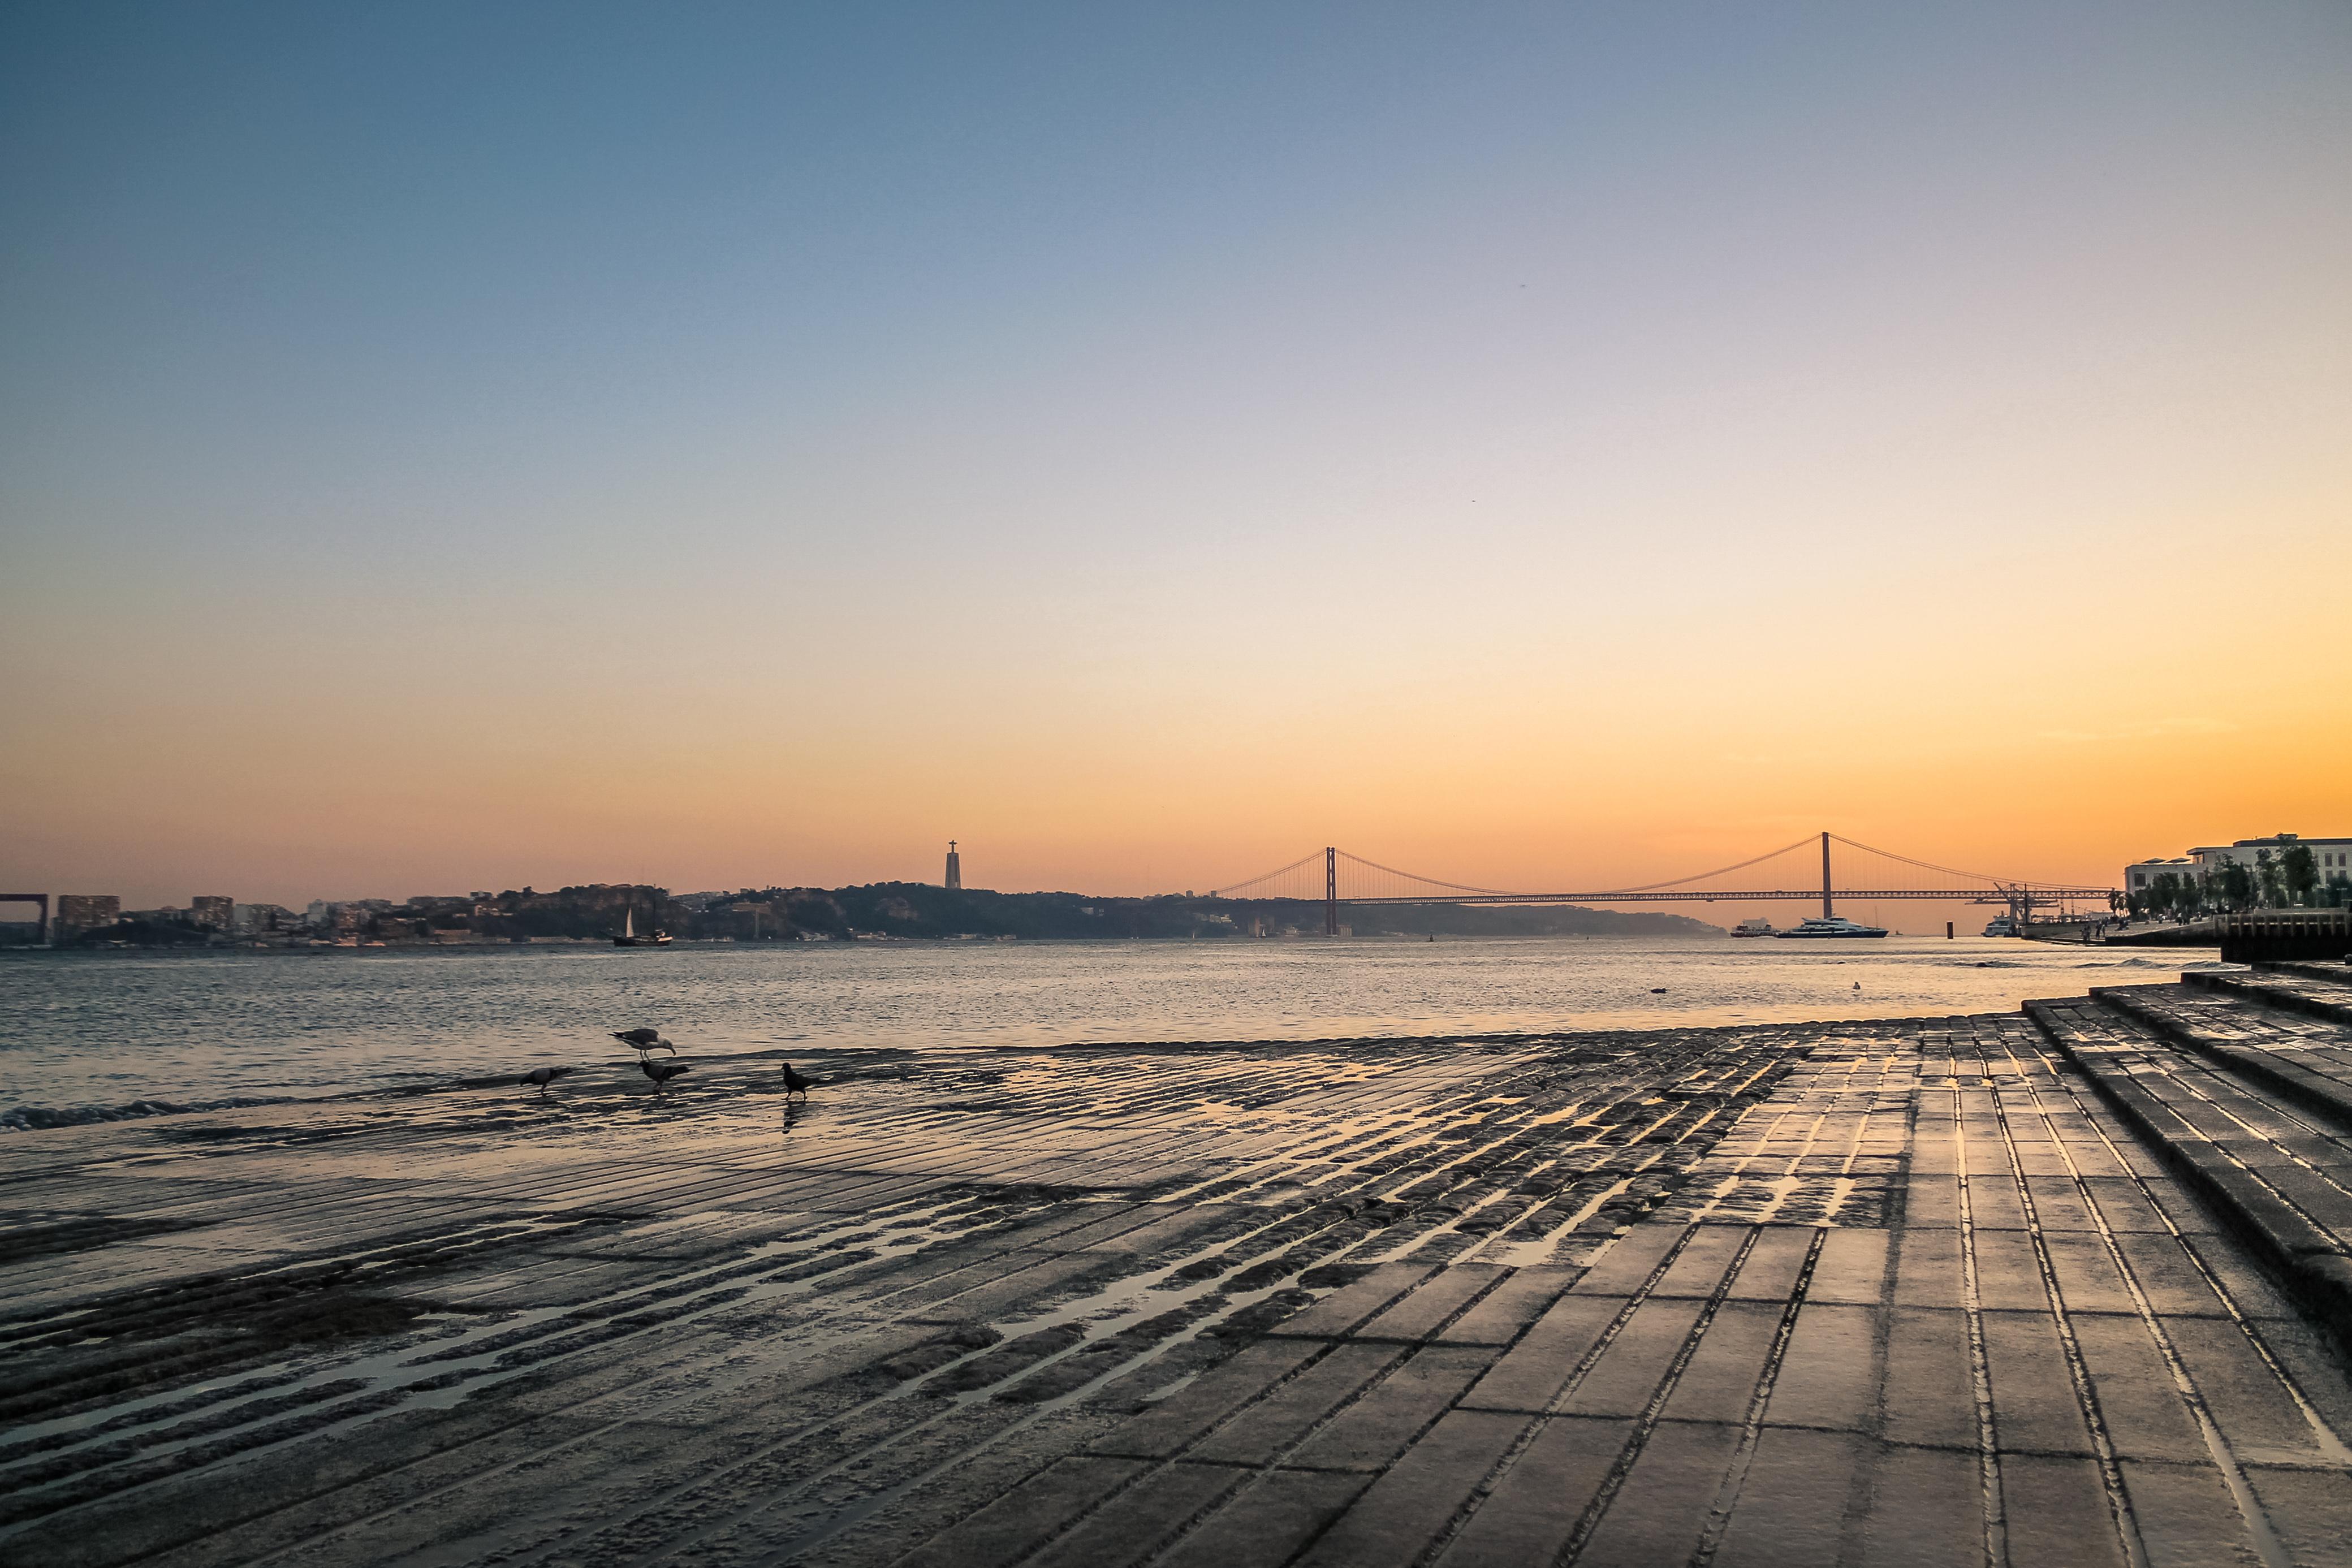 Lisbon river side at sunset, river, riverside, sailing, red, HQ Photo